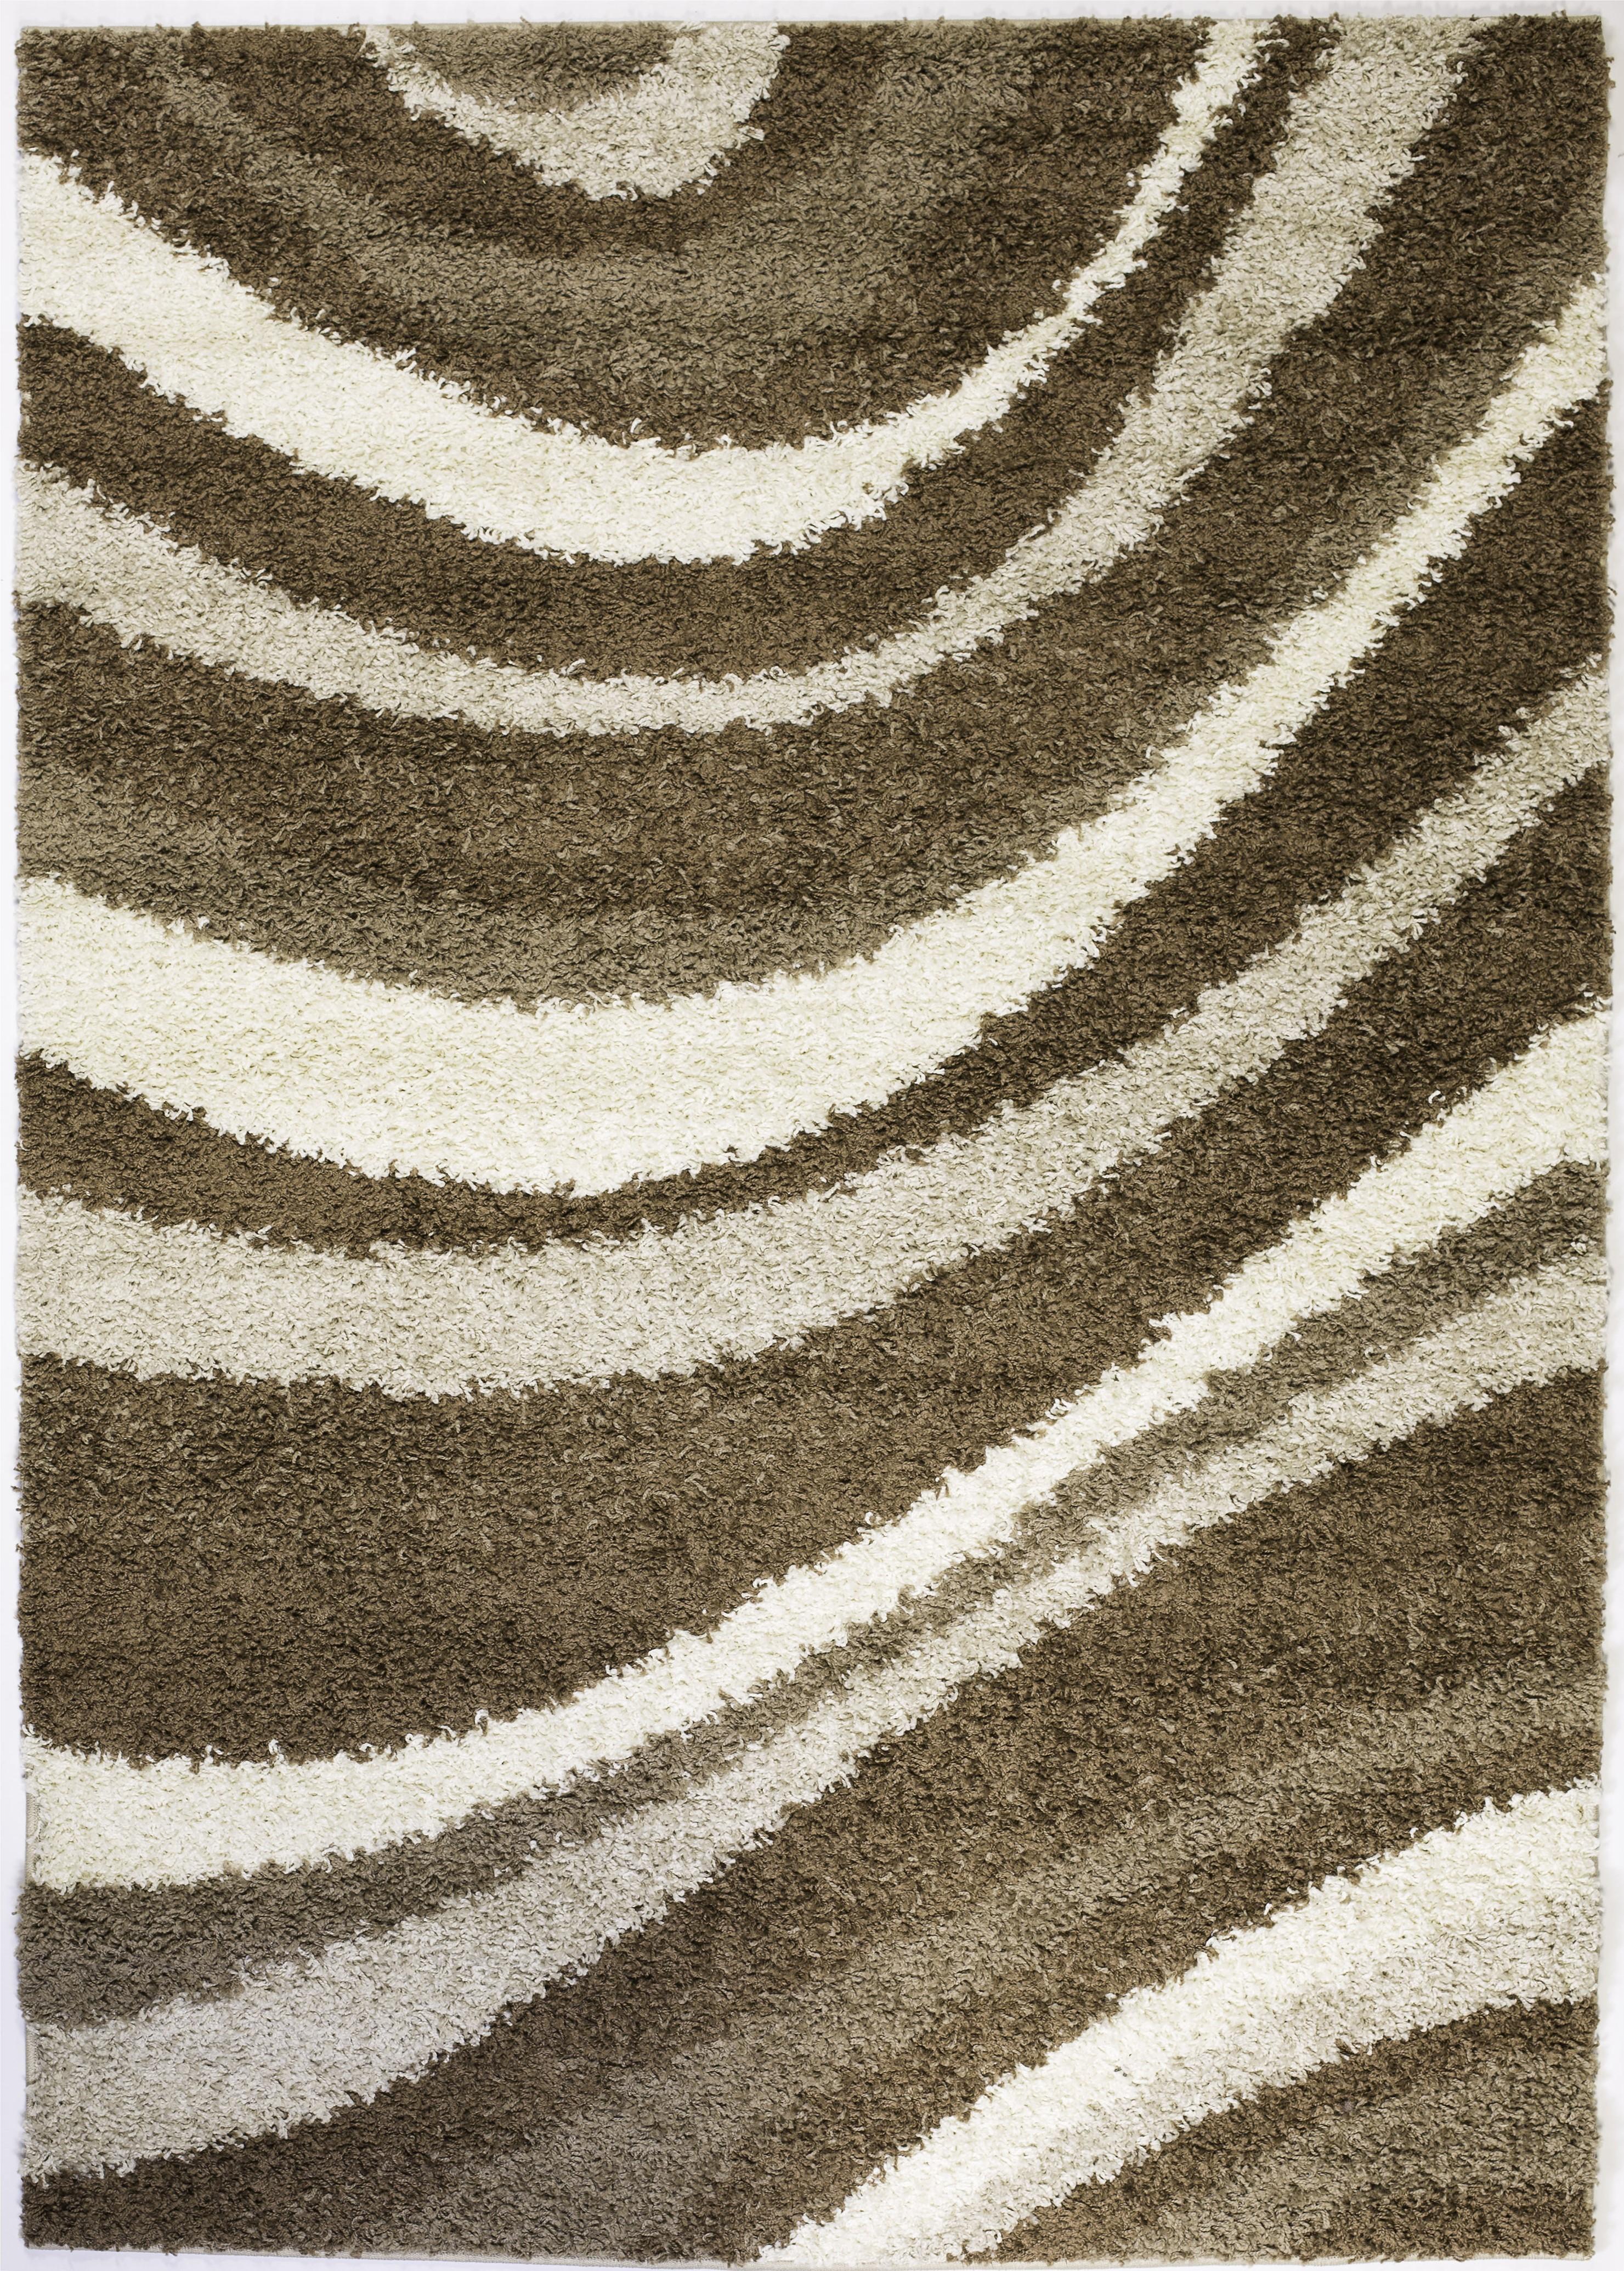 carpet texture modern modern brown carpet texture NCLMFZR